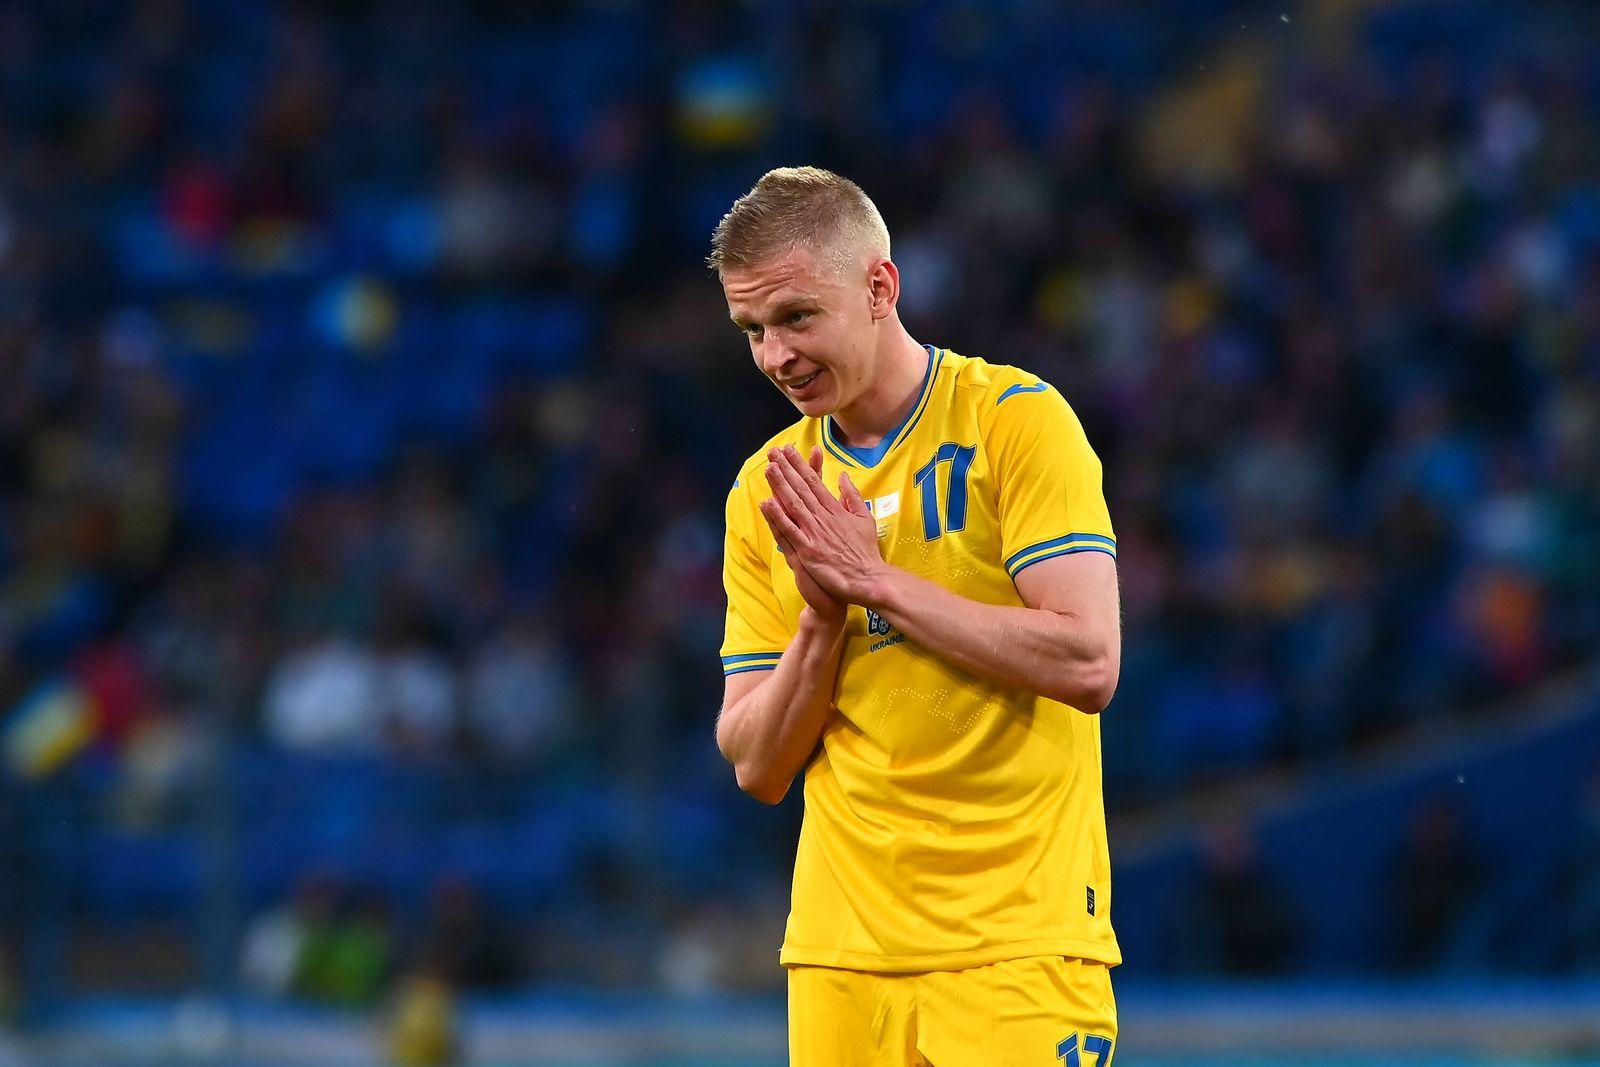 KYIV, UKRAINE - JUNE 07, 2021: Oleksandr Zinchenko (17), The football match Ukraine vs Cyprus Copyright: xVitaliixKliui